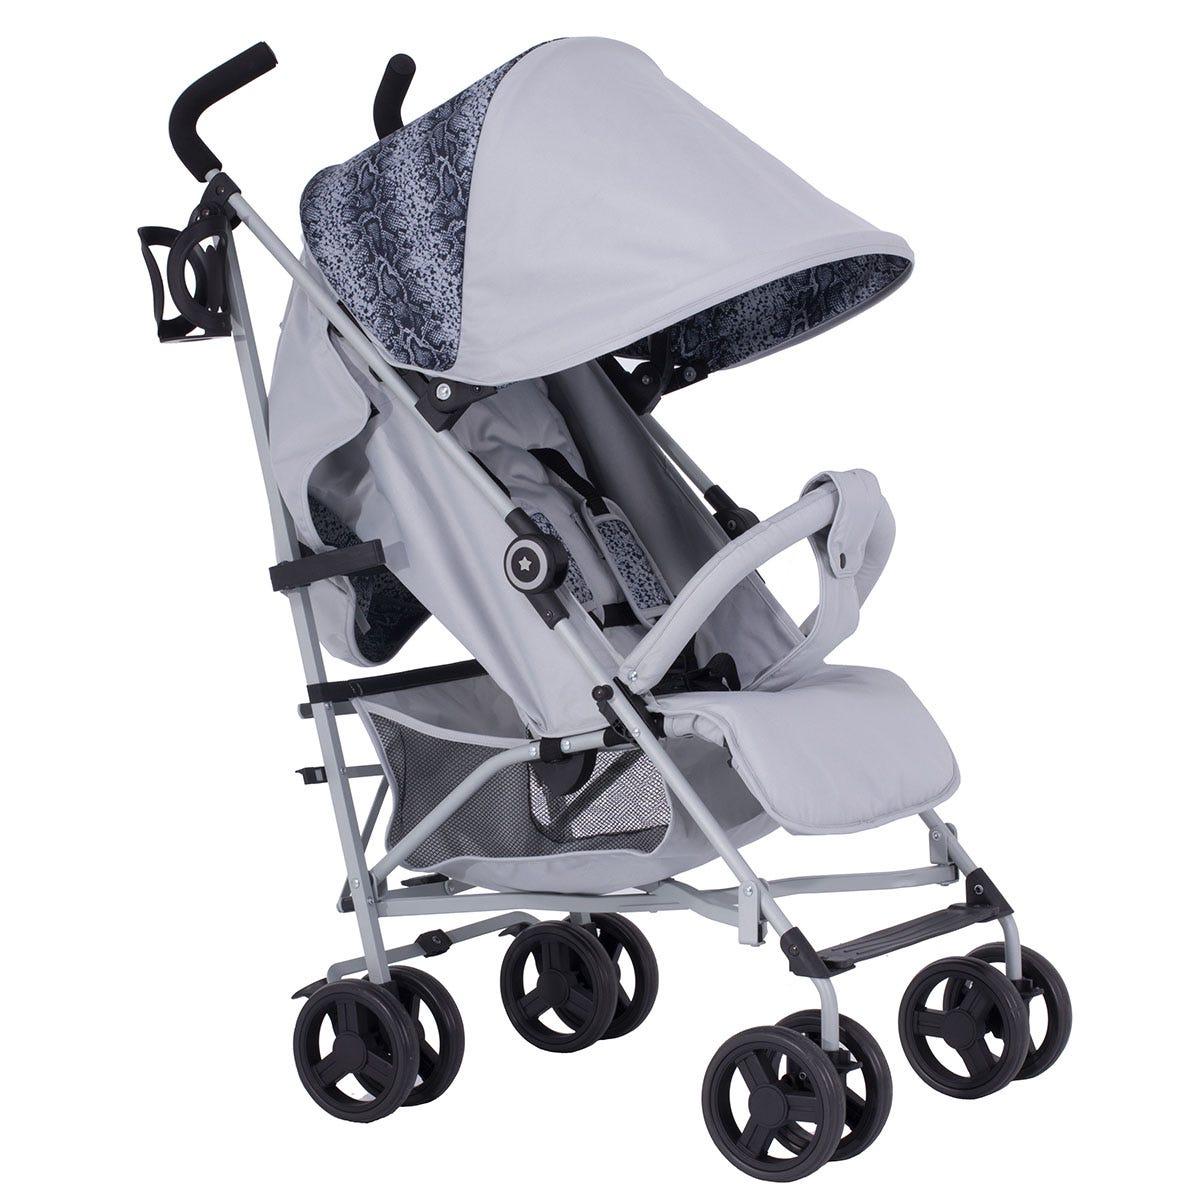 My Babiie Dreamiie MB02 Stroller - Platinum Snake